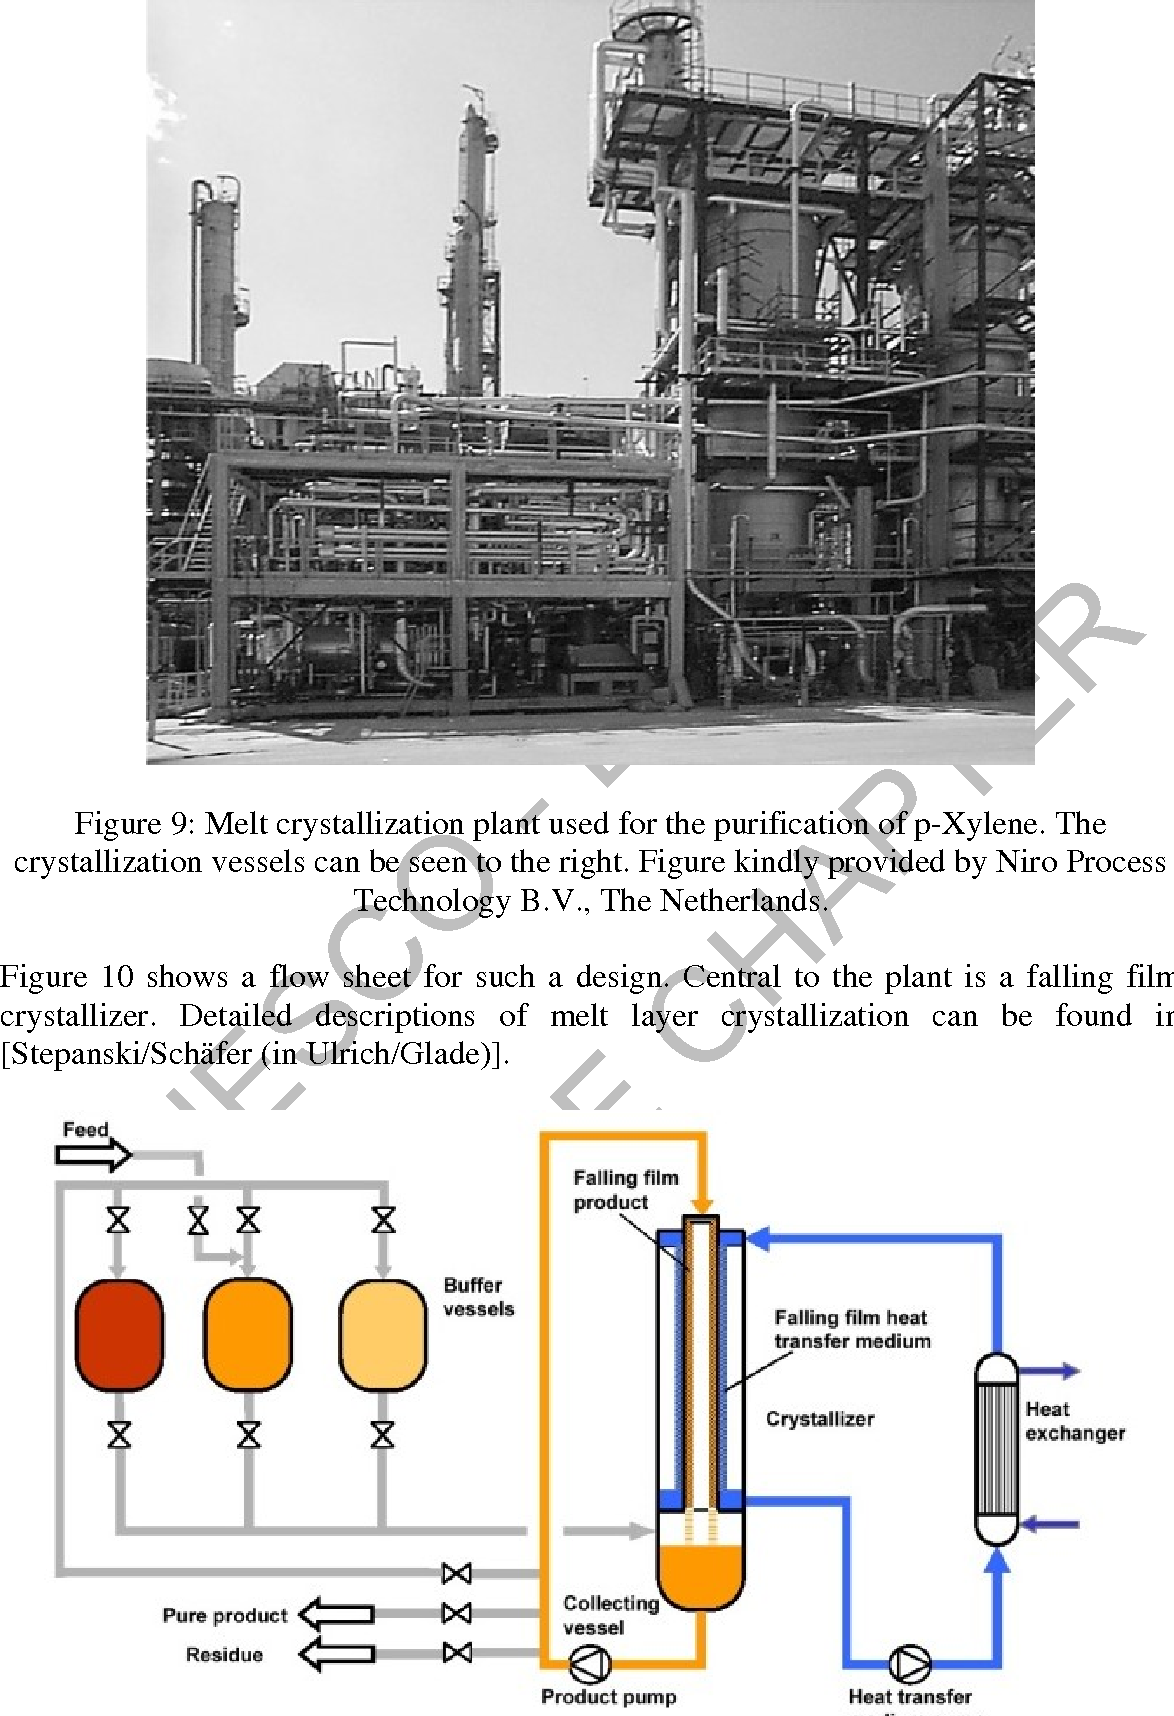 Heat And Mass Transfer Operations Crystallization Semantic Scholar Process Flow Diagram Of Xylene